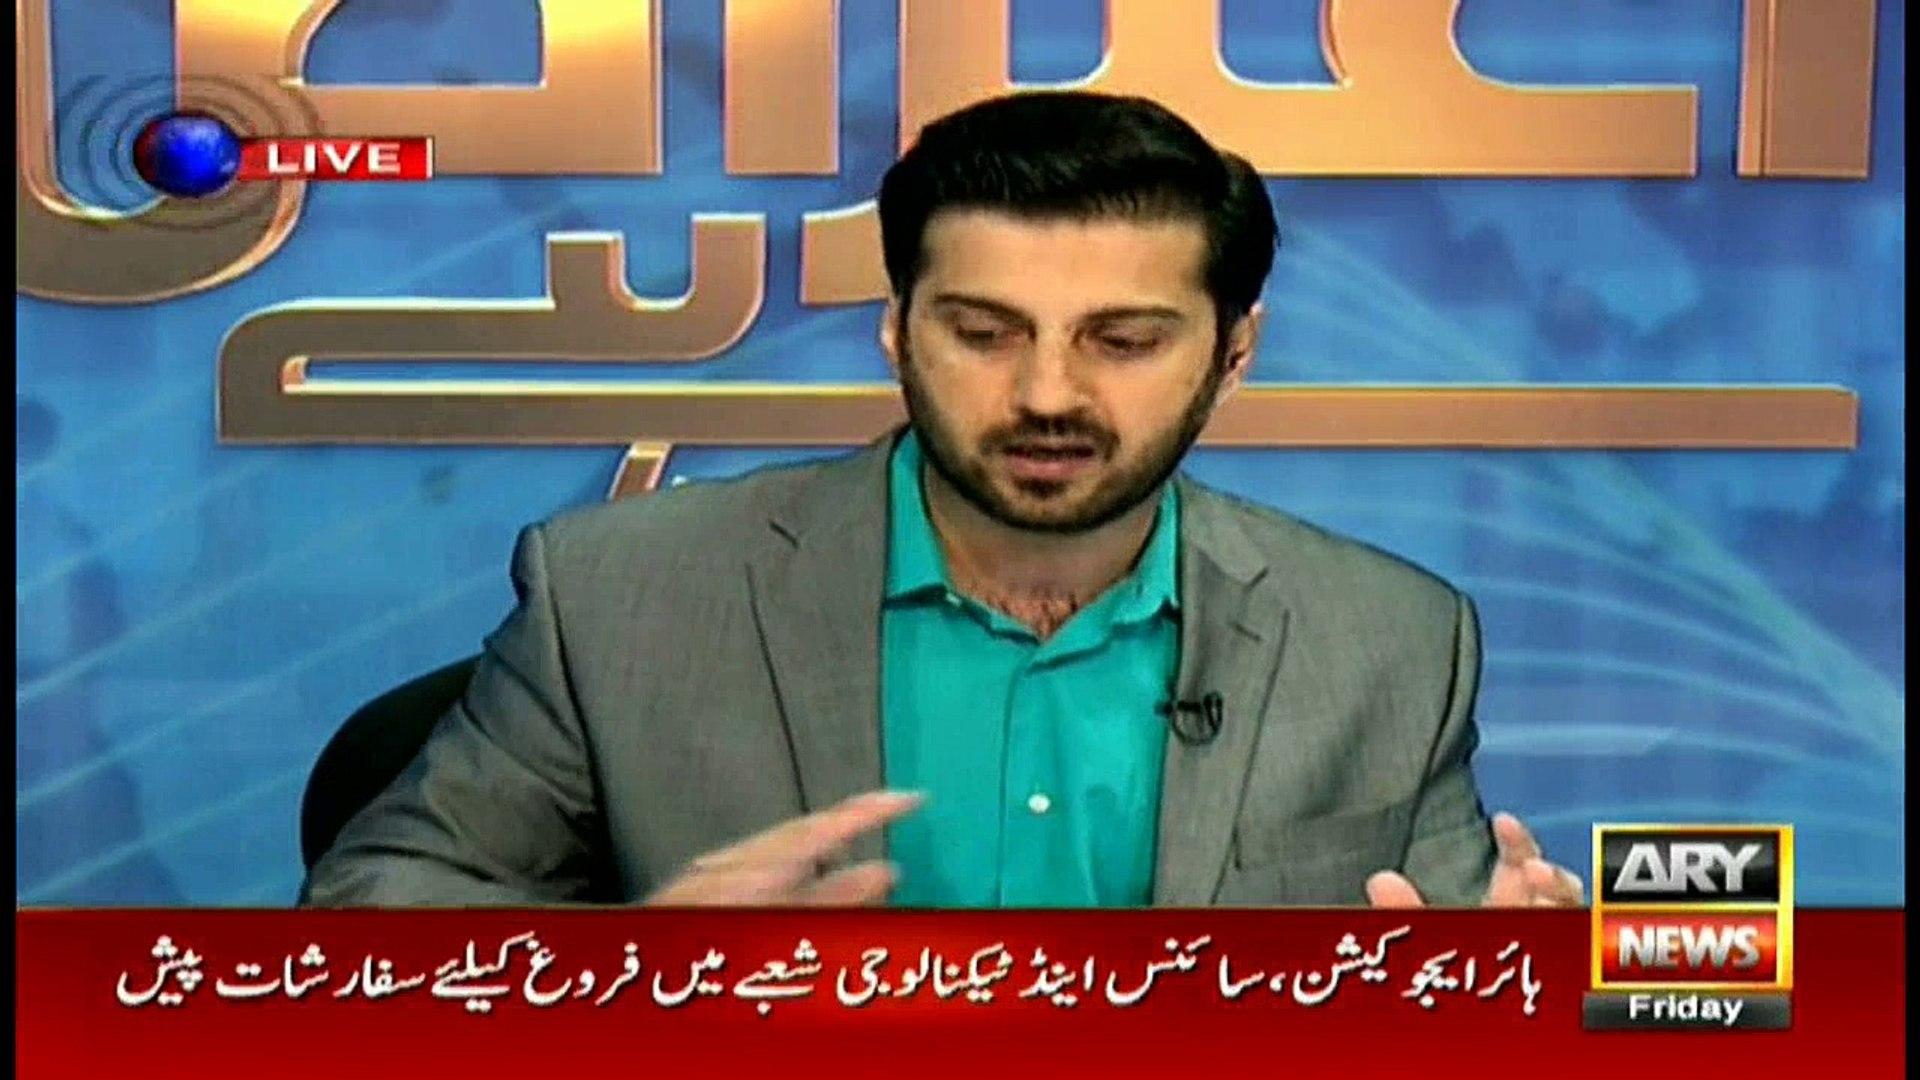 Will auction of cars raise enough to waive off debts? asks Mustafa Nawaz Khokhar